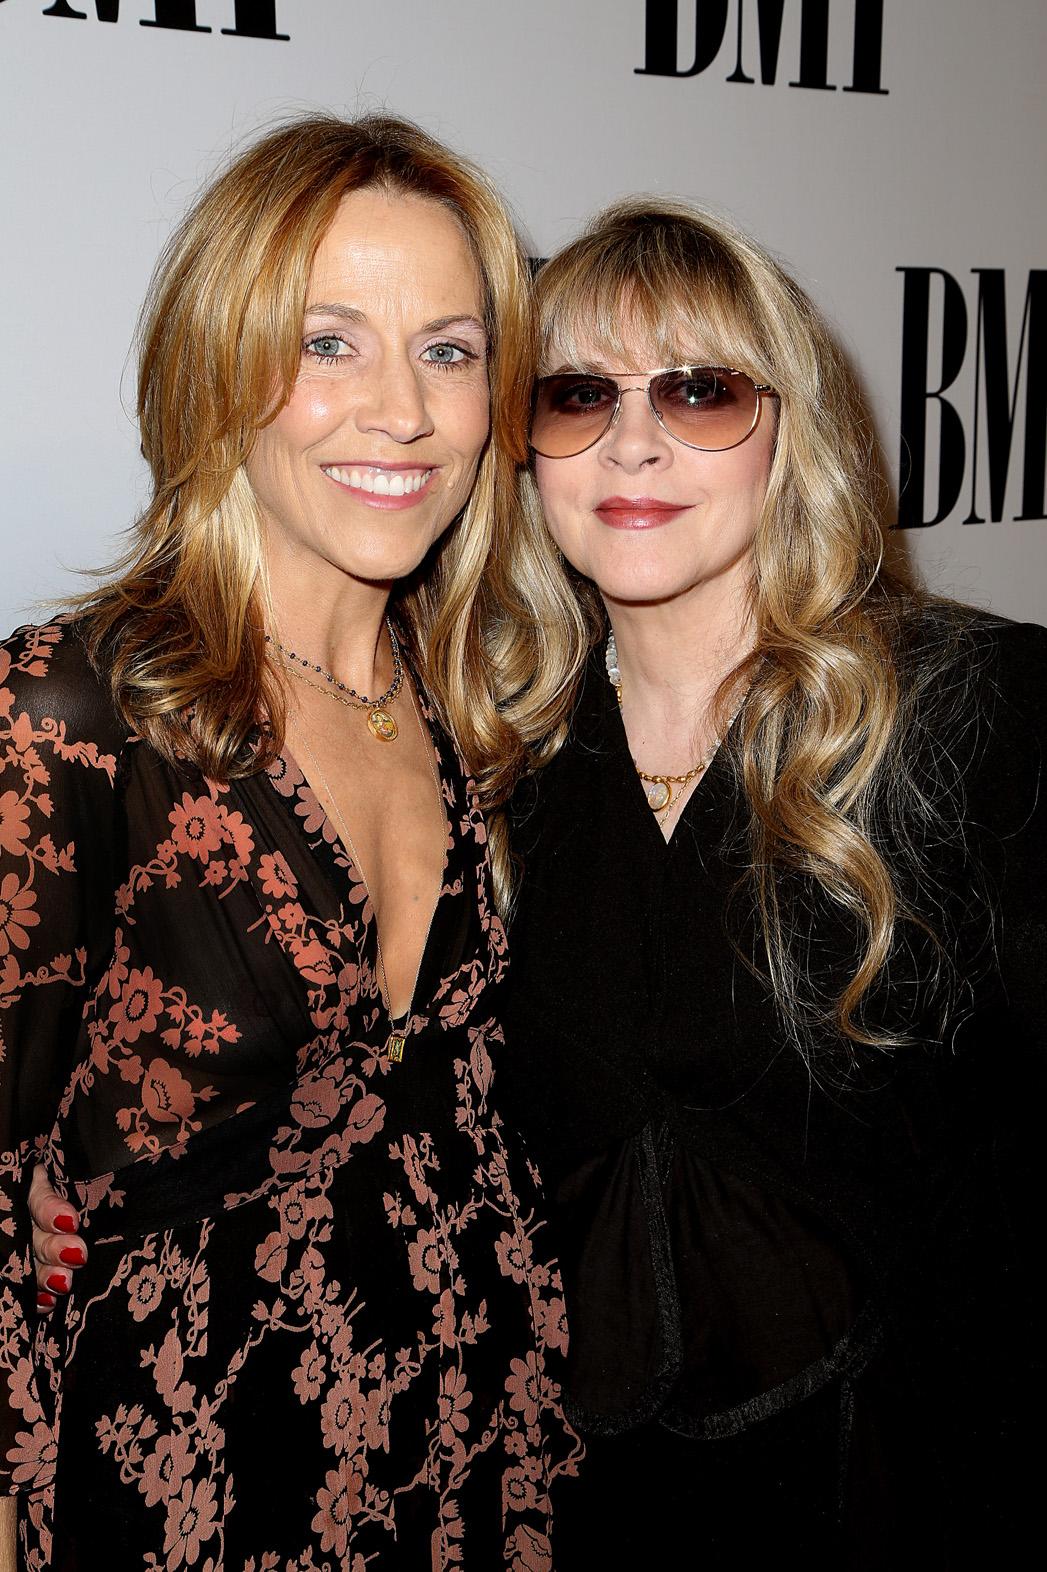 Stevie Nicks and Sheryl Crow BMI - P 2014